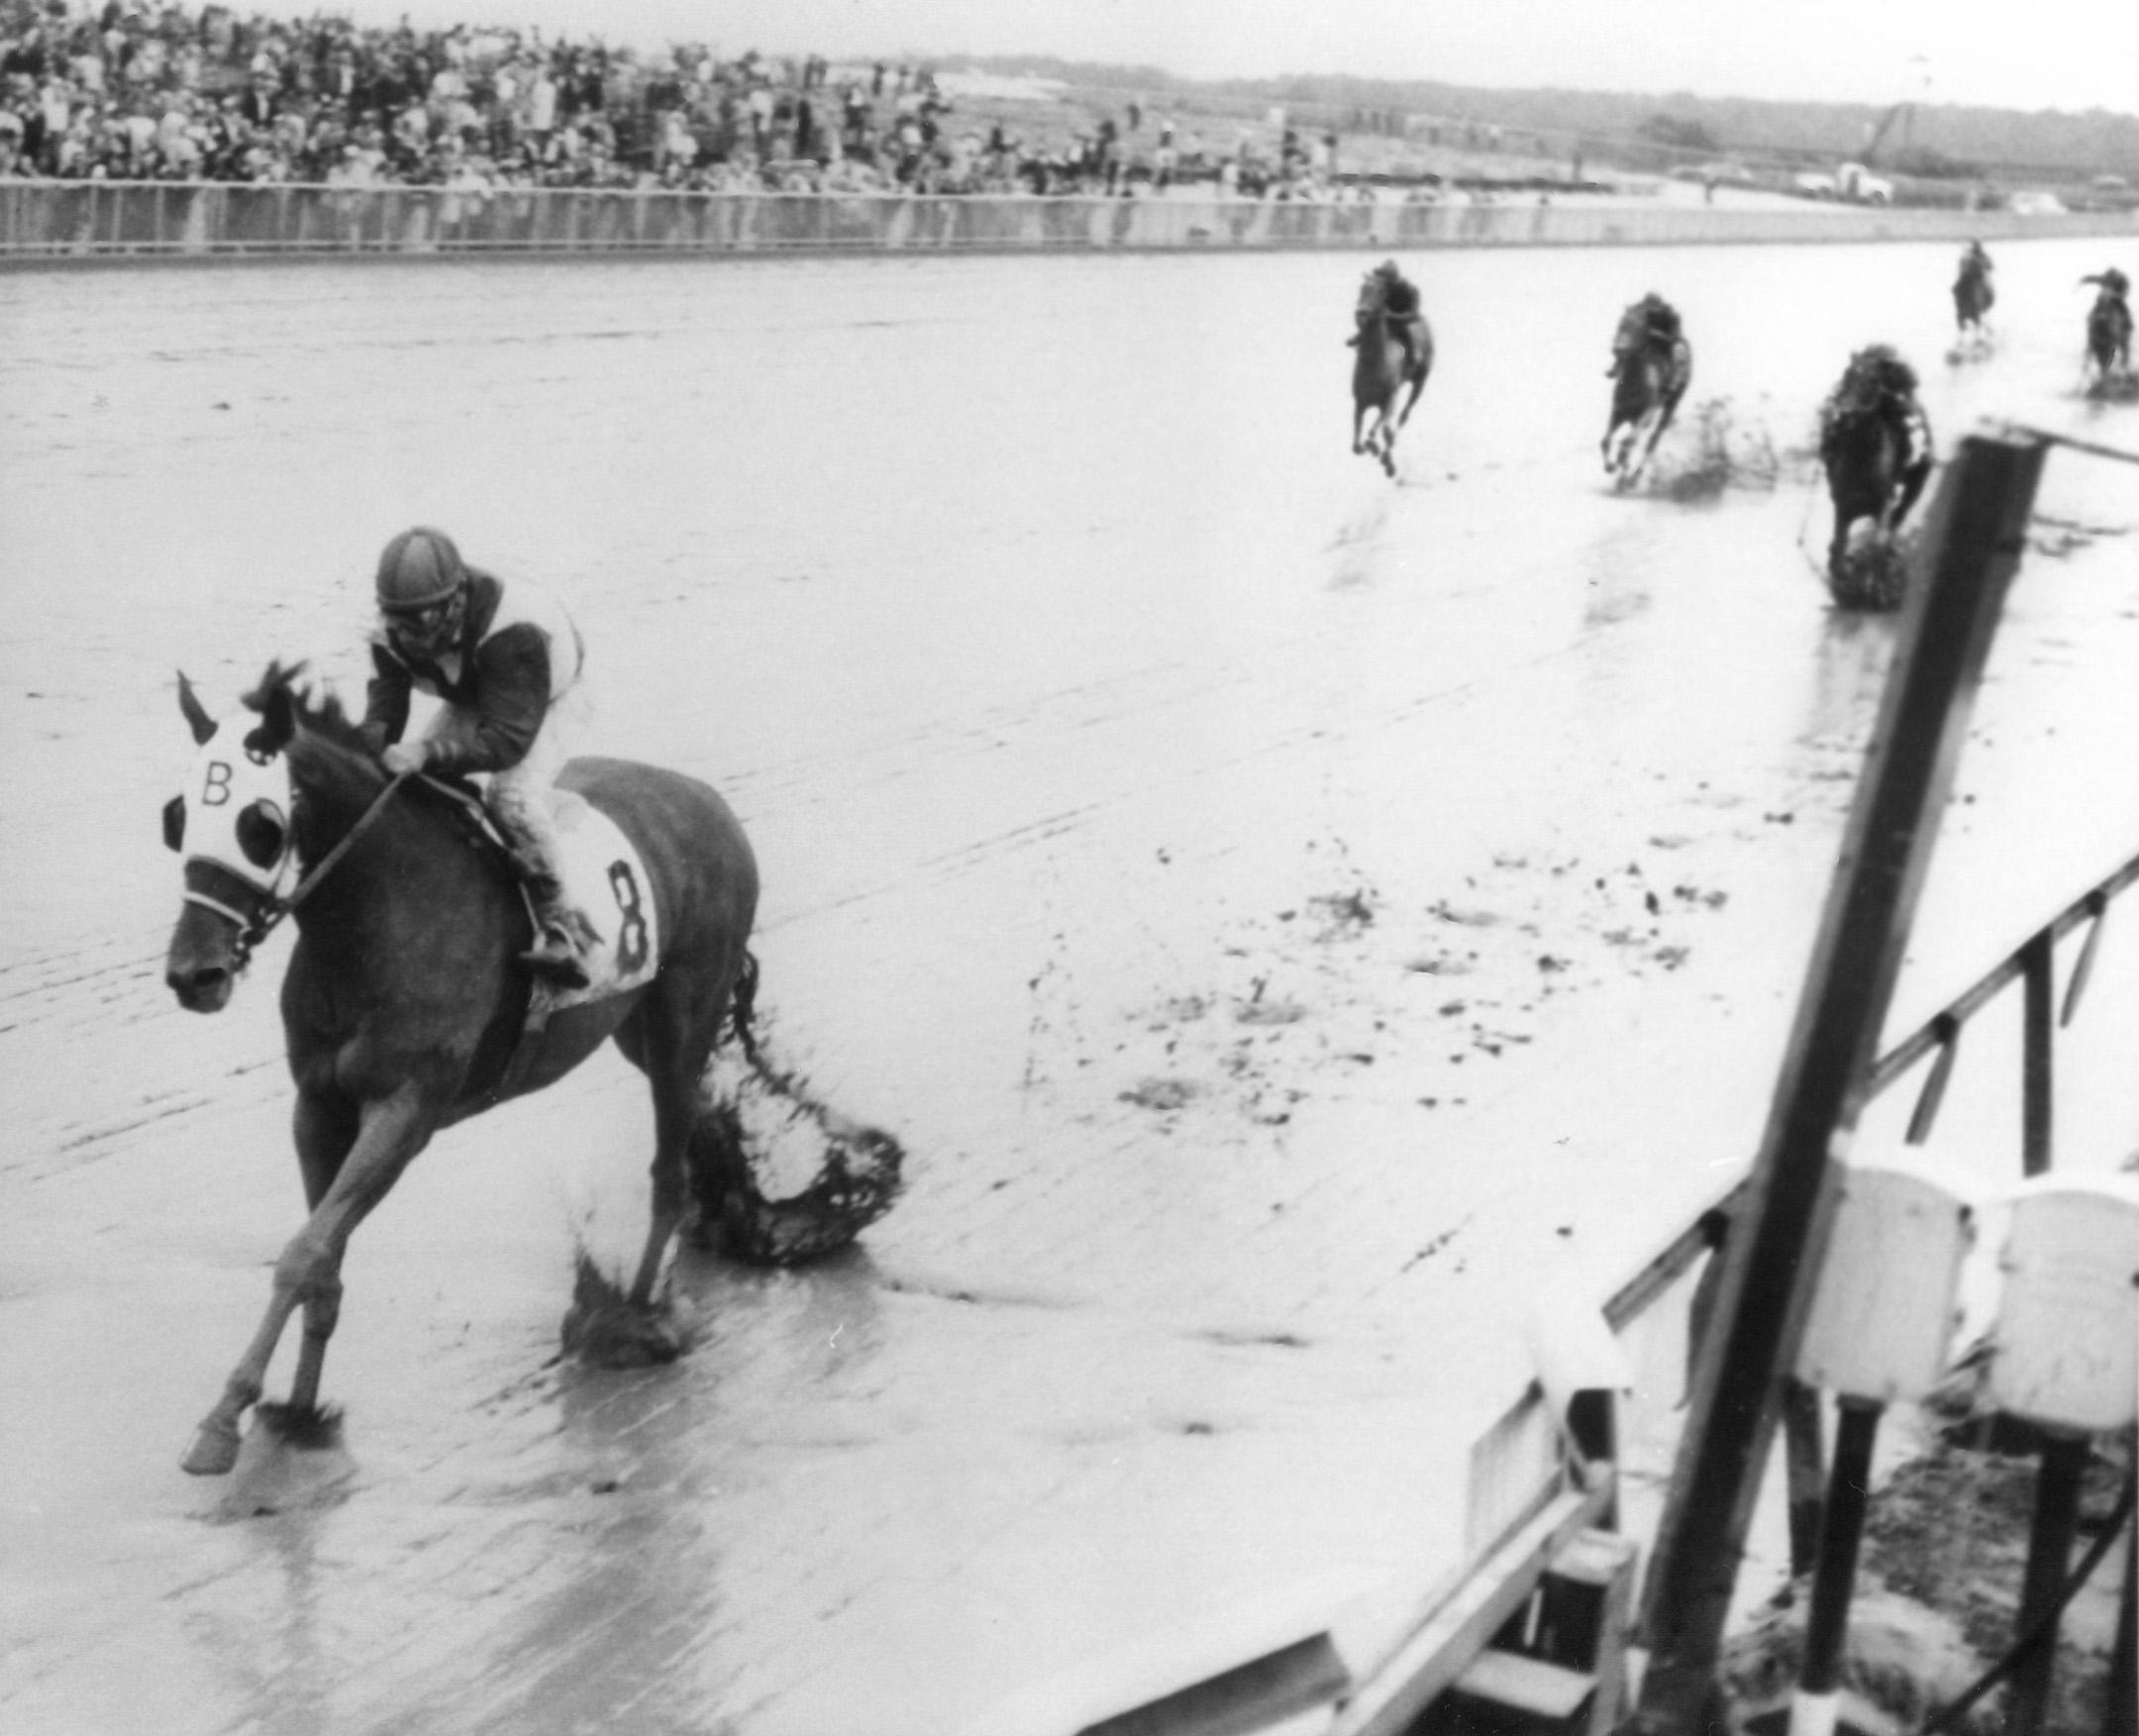 Tosmah (Sam Boulmetis up) winning the 1963 Mermaid Handicap at Atlantic City Race Course (Turfotos/Museum Collection)